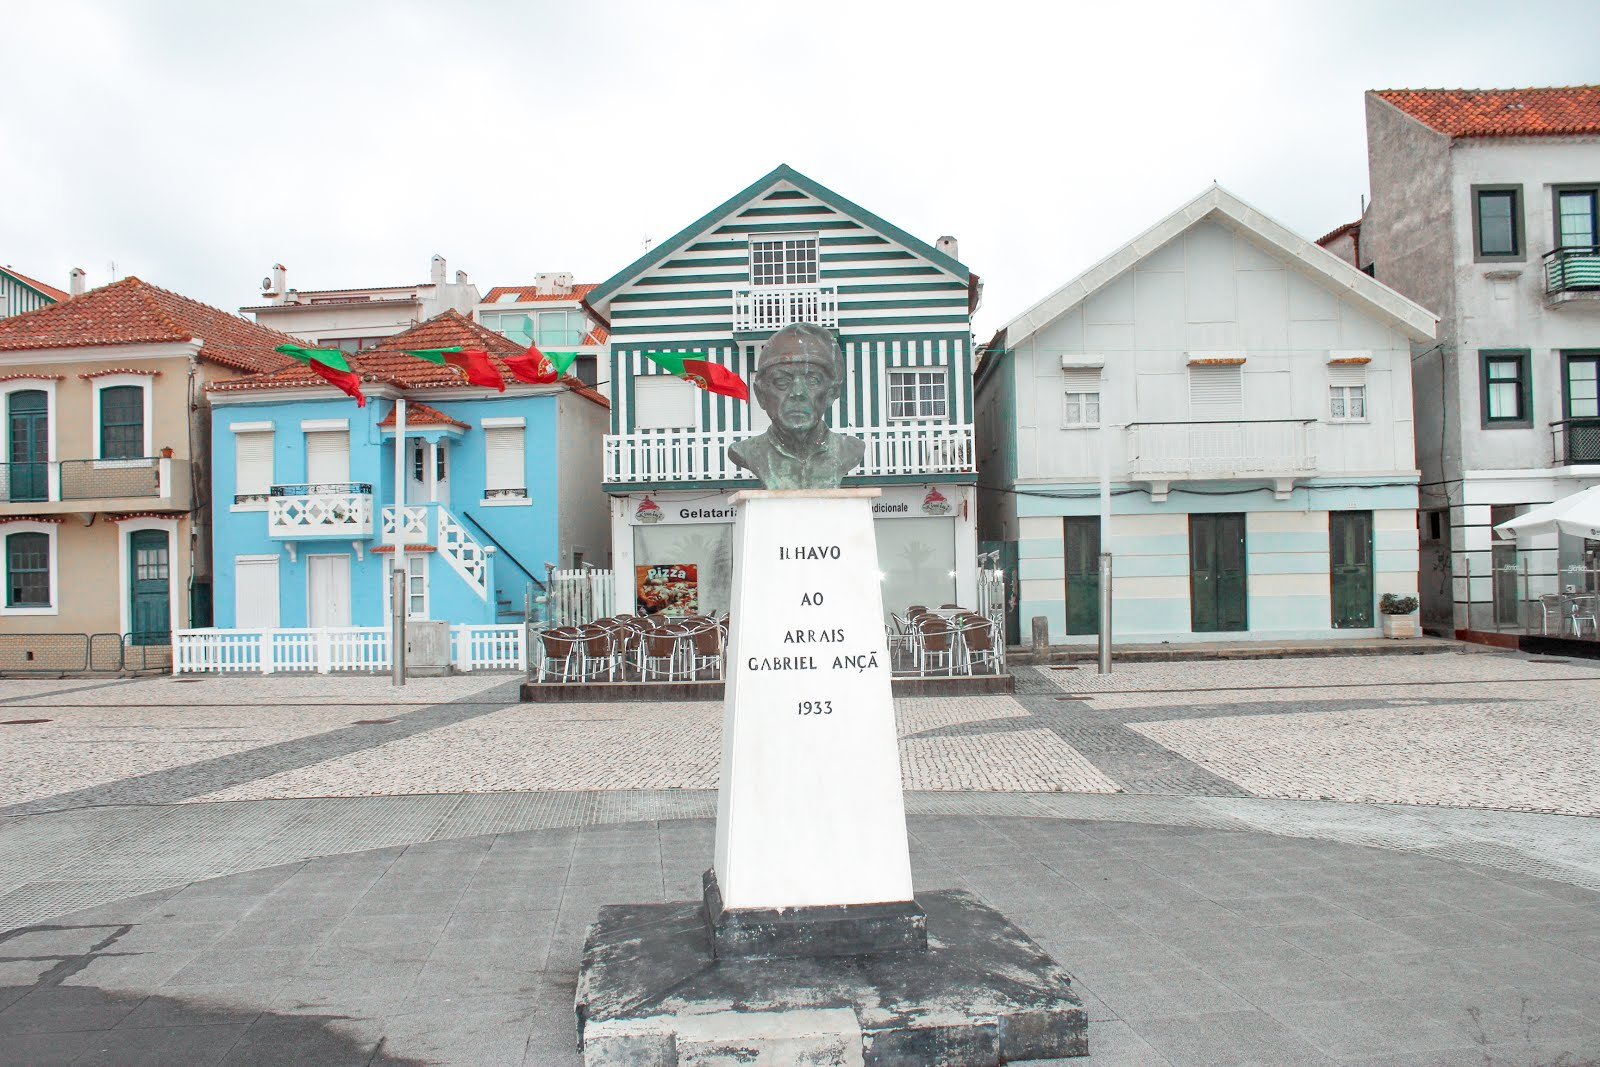 Monumento Costa Nova Aveiro